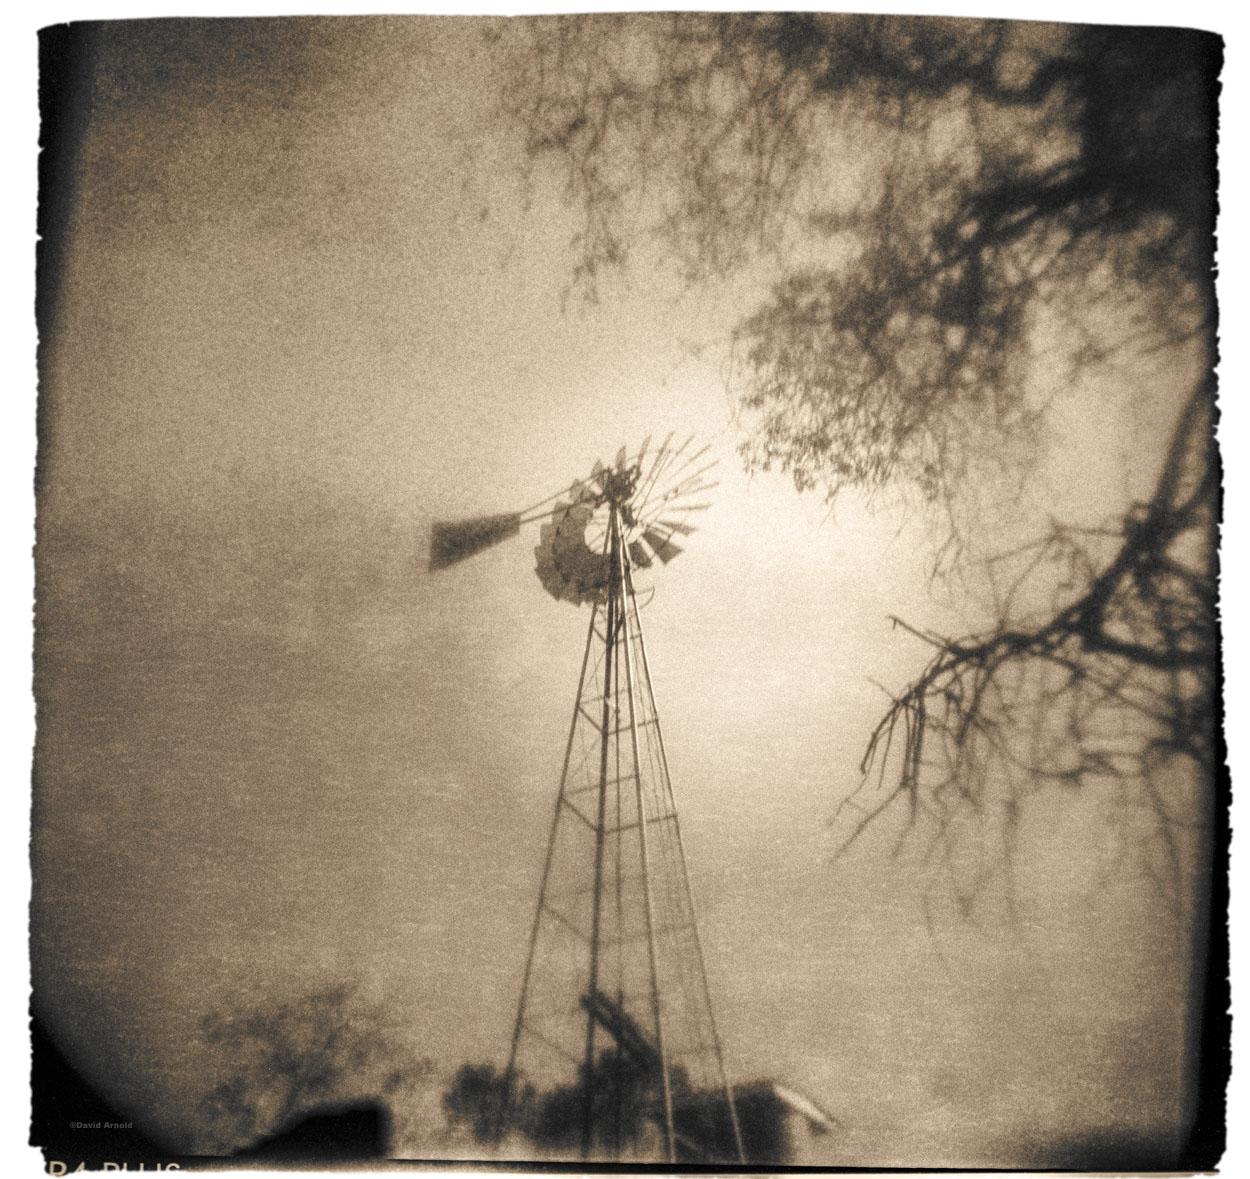 Windmill, Chinese Camp, Tuolumne County, California.